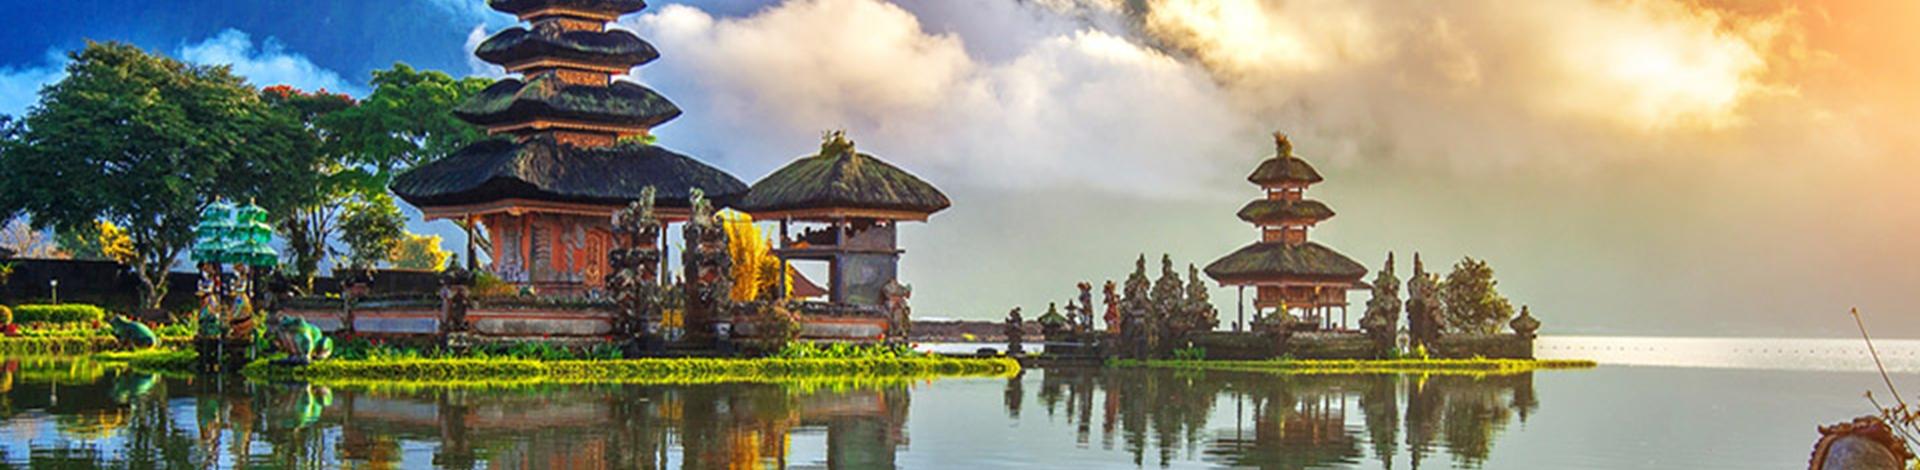 Ambon Island